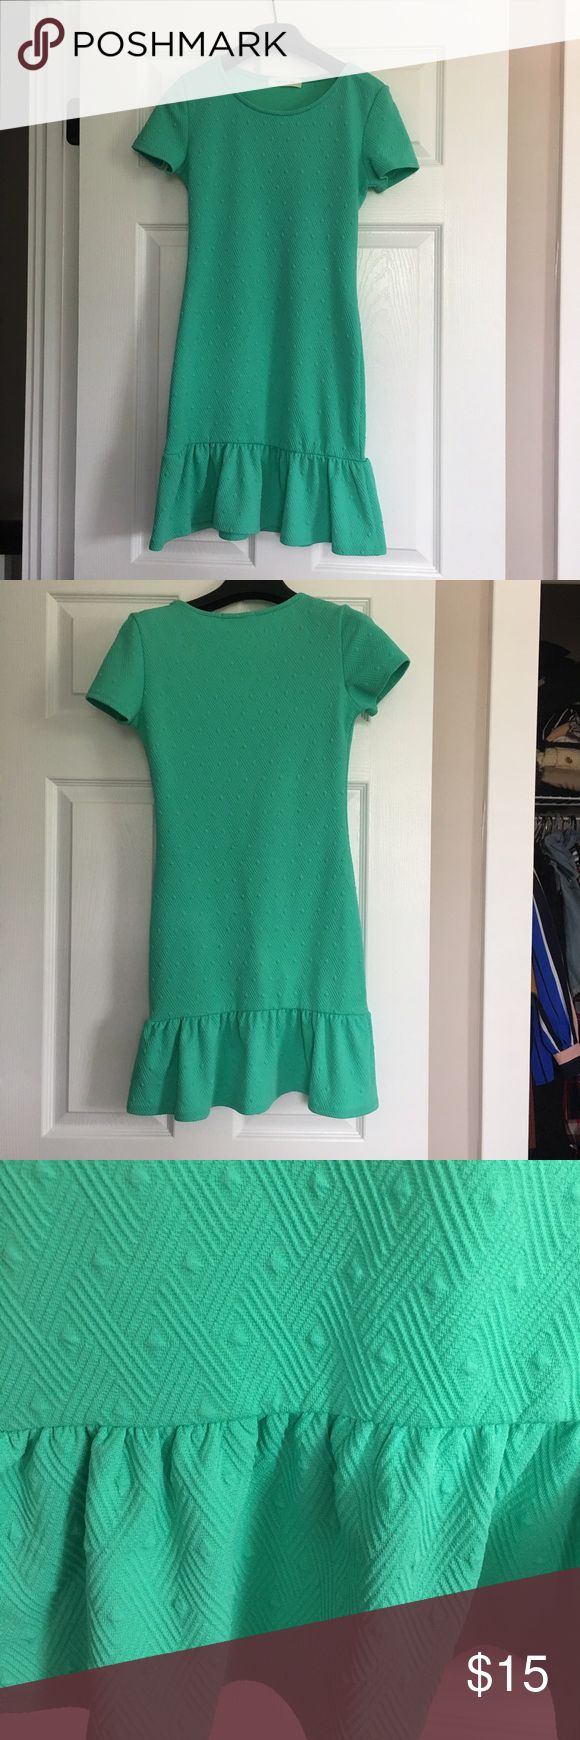 Mint green textured dress 👗 Body-con, mint green, textured, fit and flare dress. ASOS Petite Dresses Mini